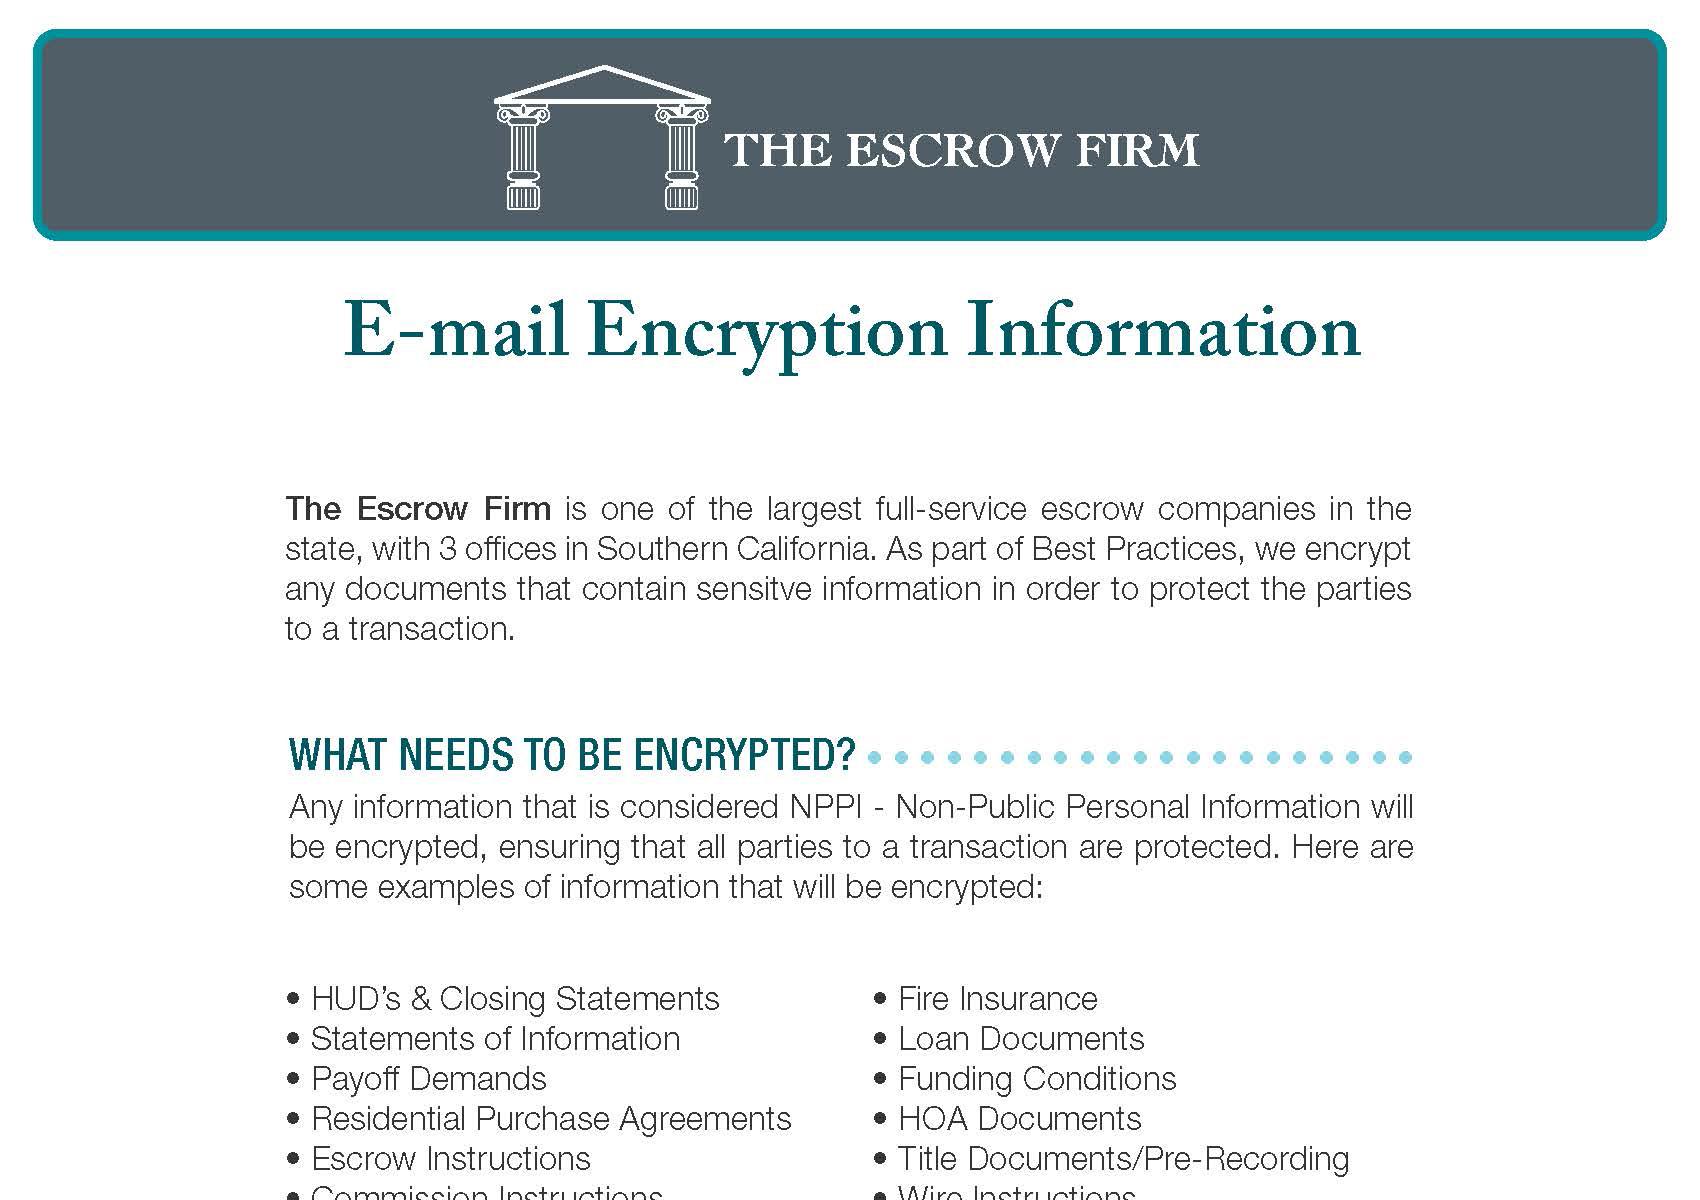 Encryption Information